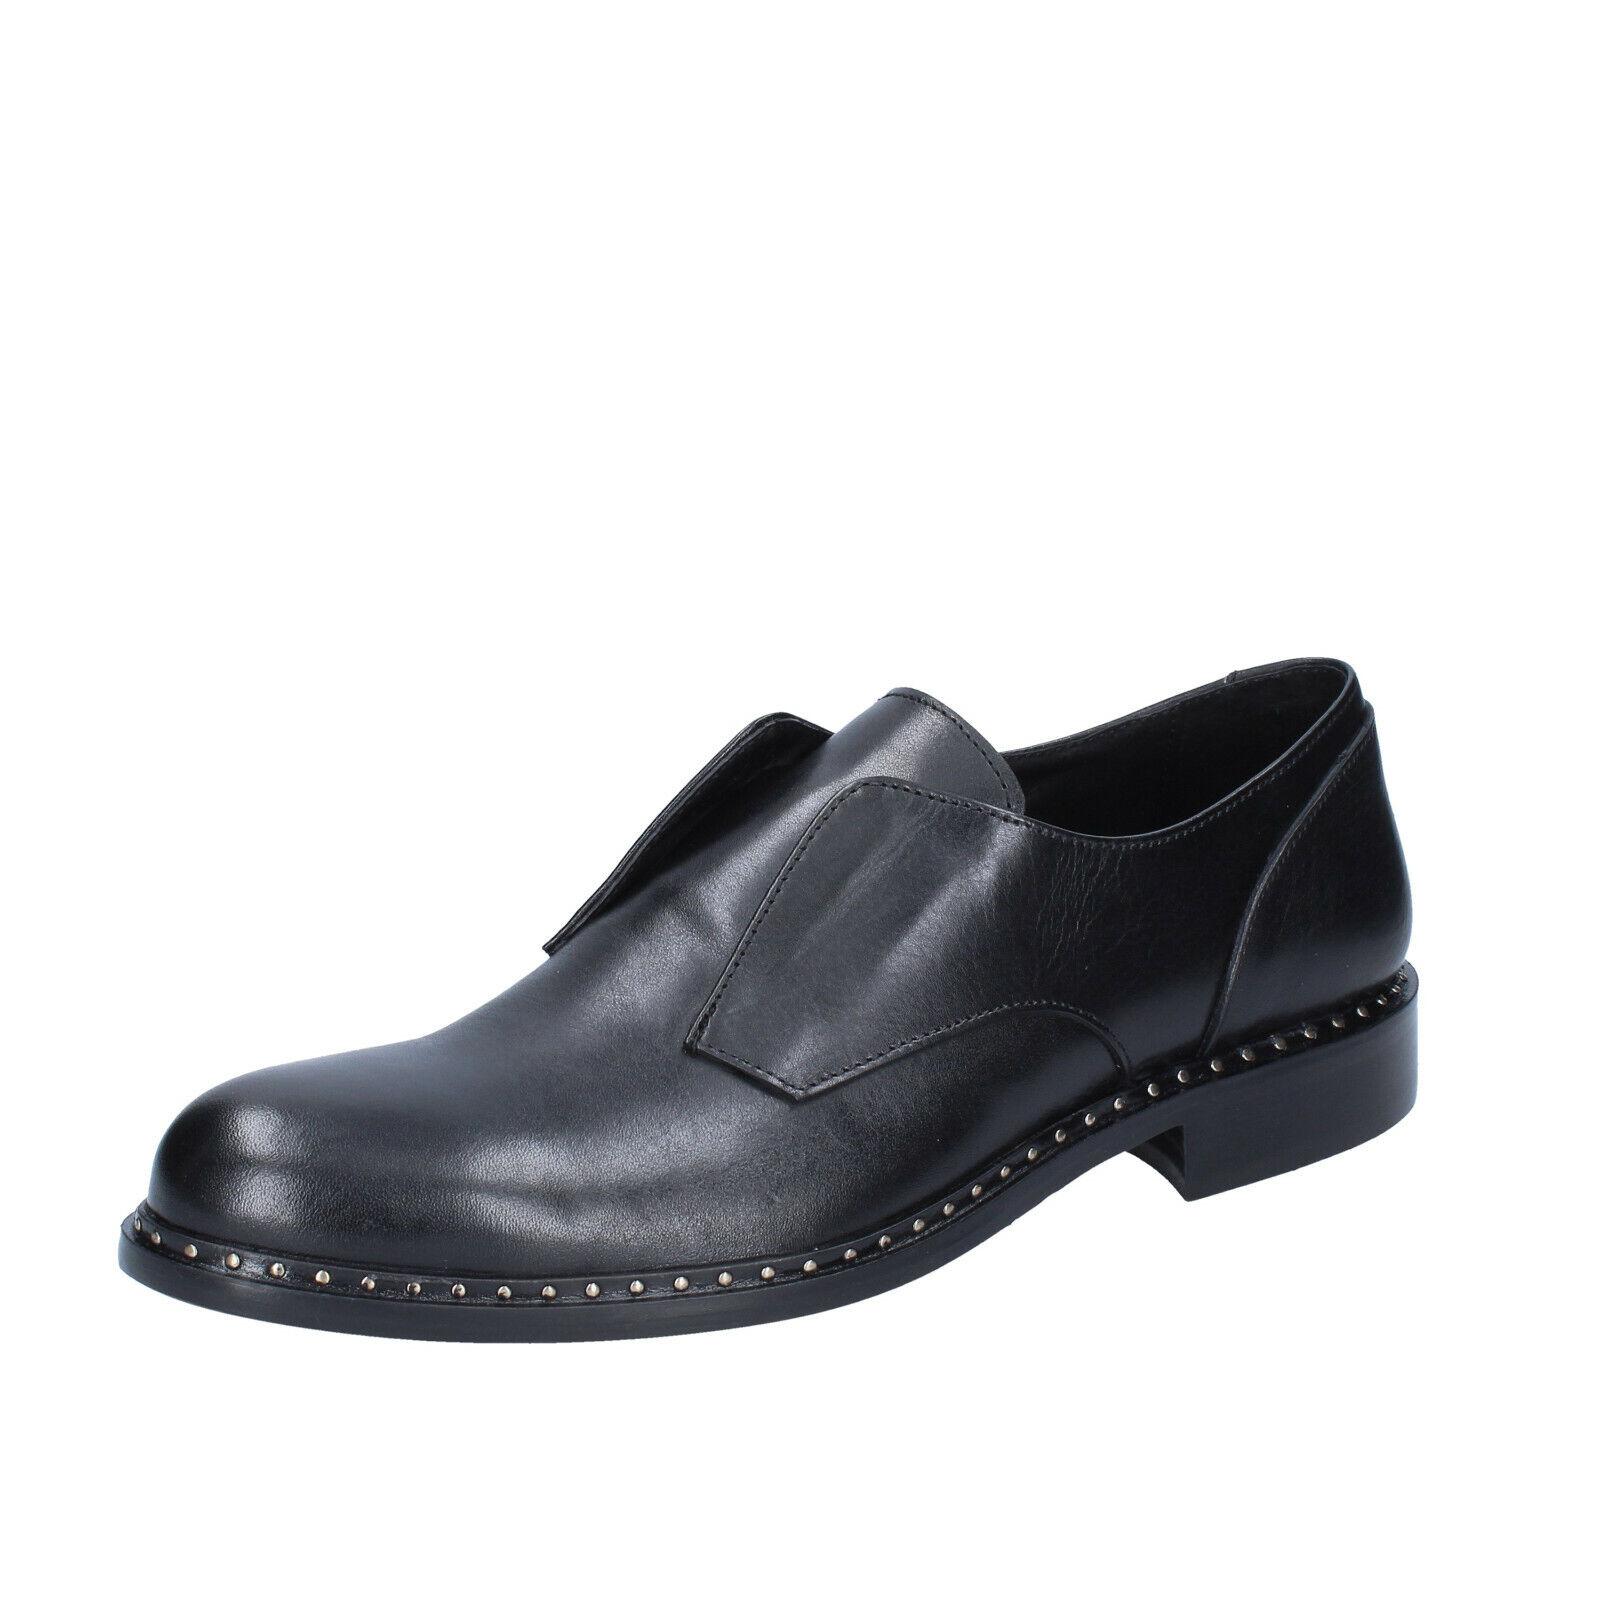 Herren schuhe BARCA 43 EU elegante schwarz leder BS688-43    | Louis, ausführlich